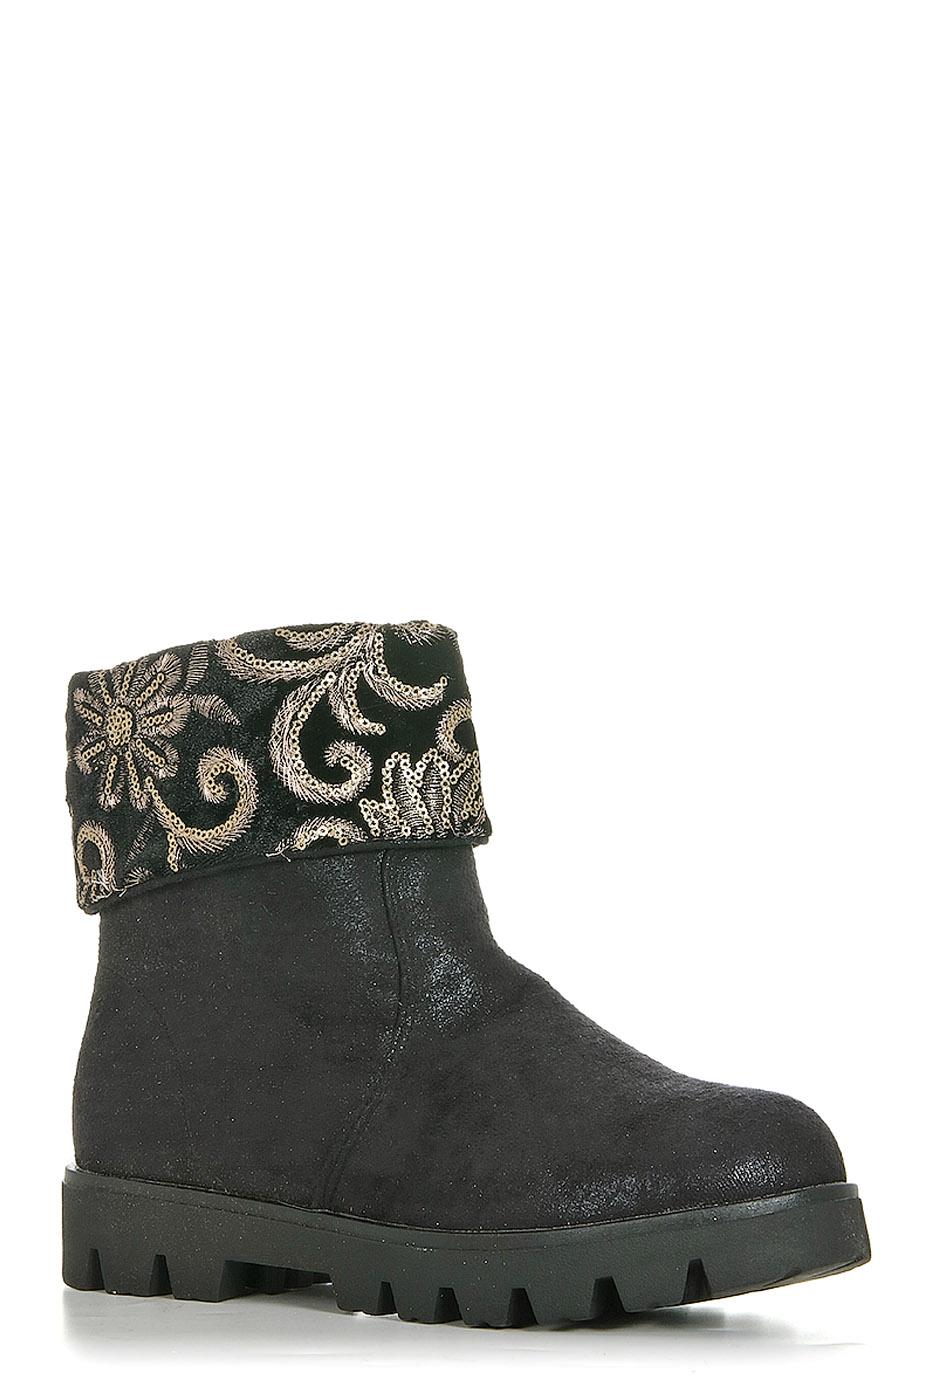 Ботинки TOPLAND2352-PB76171B/BLACK